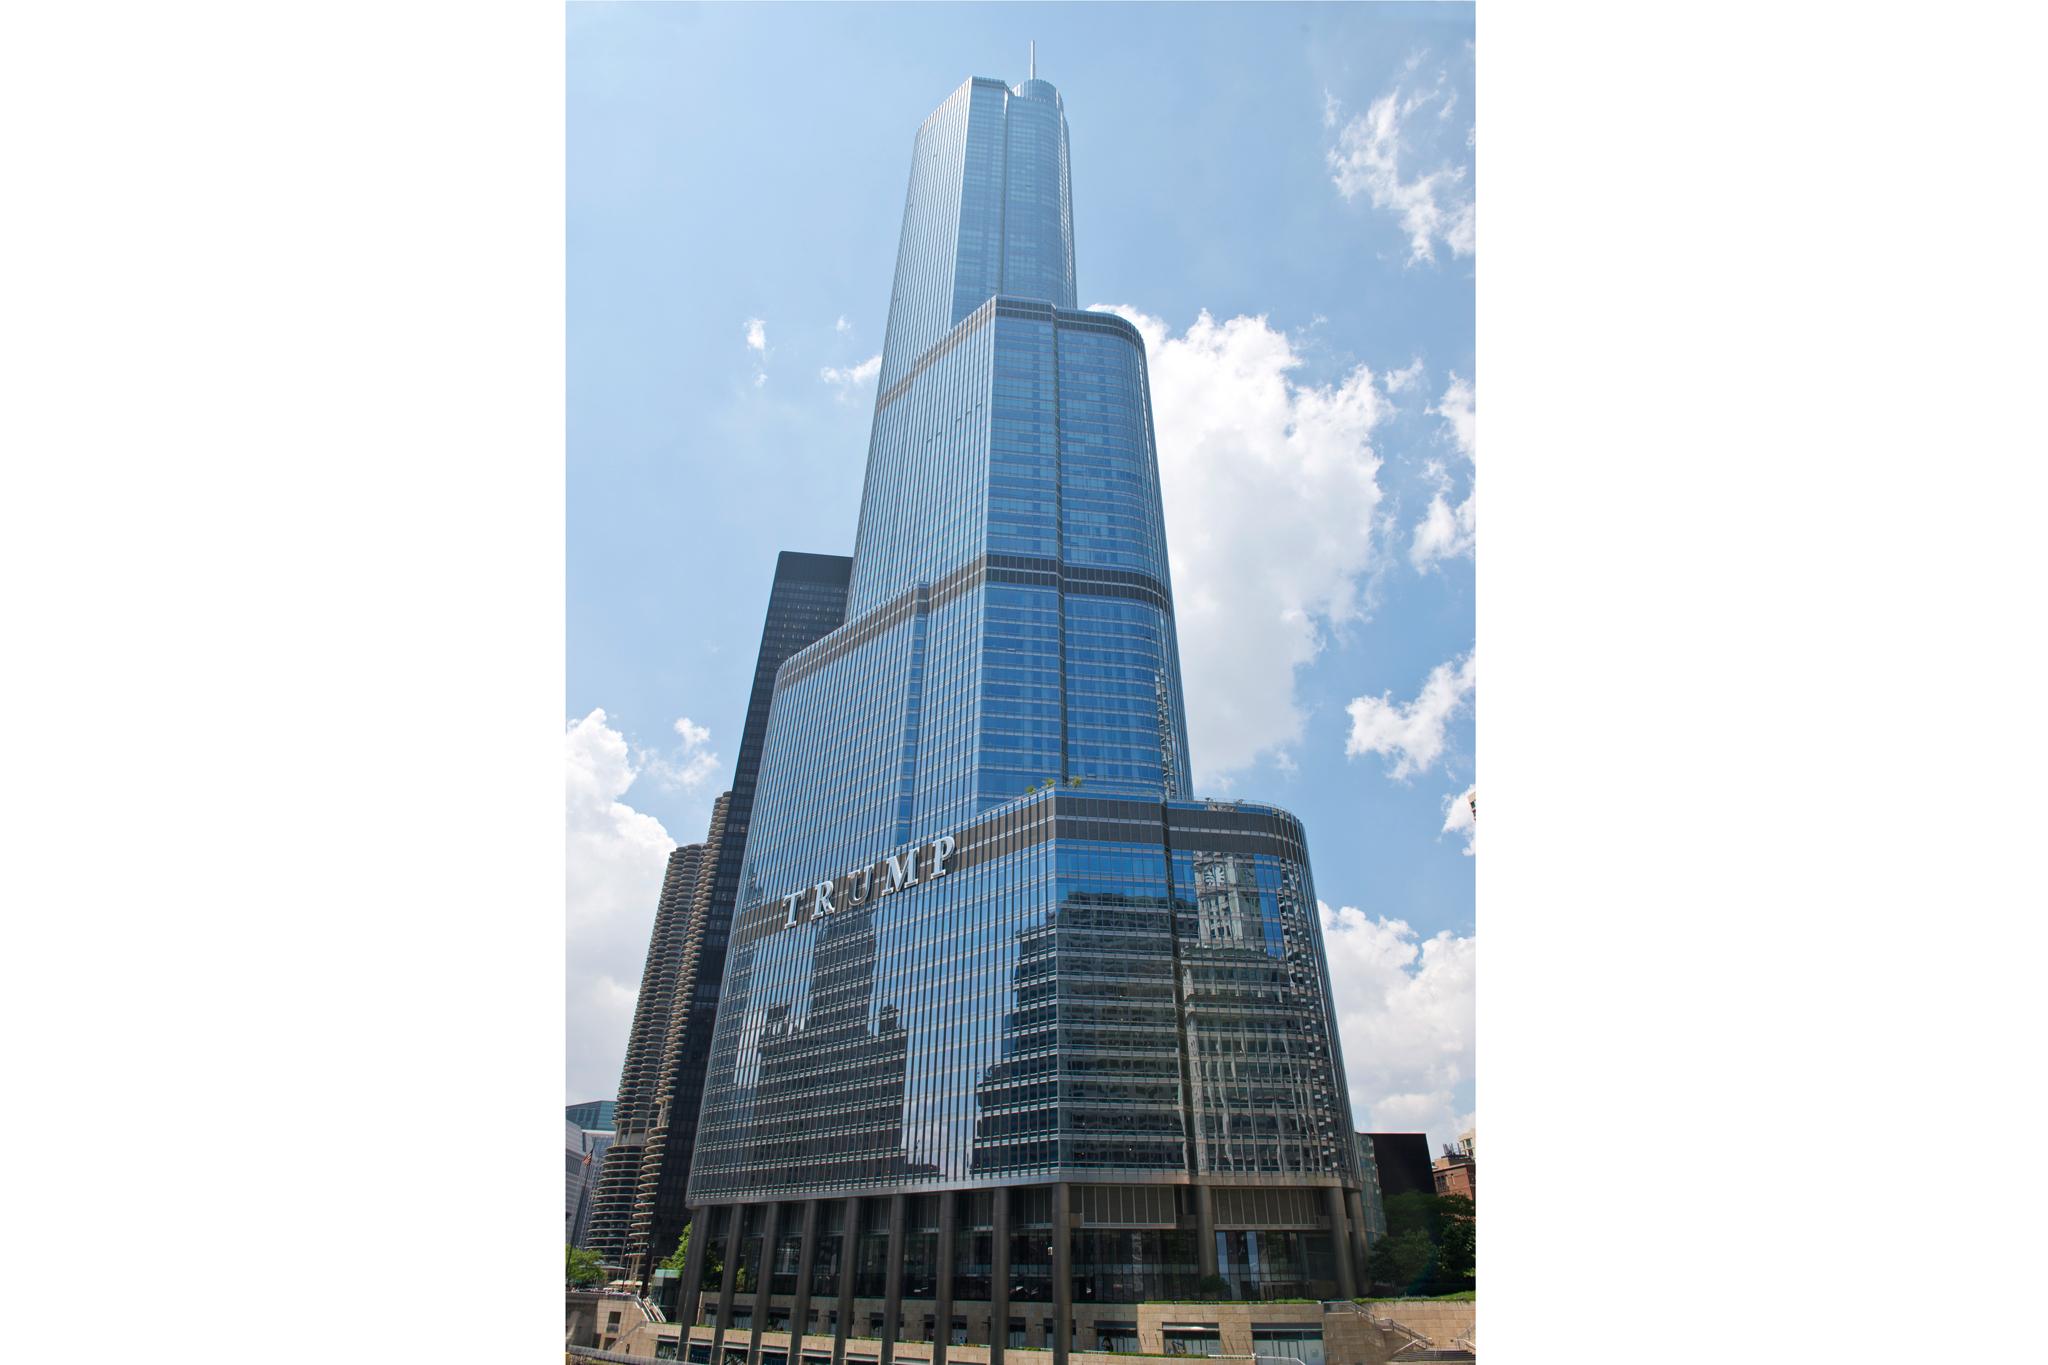 Trump Tower, 401 N Wabash Ave